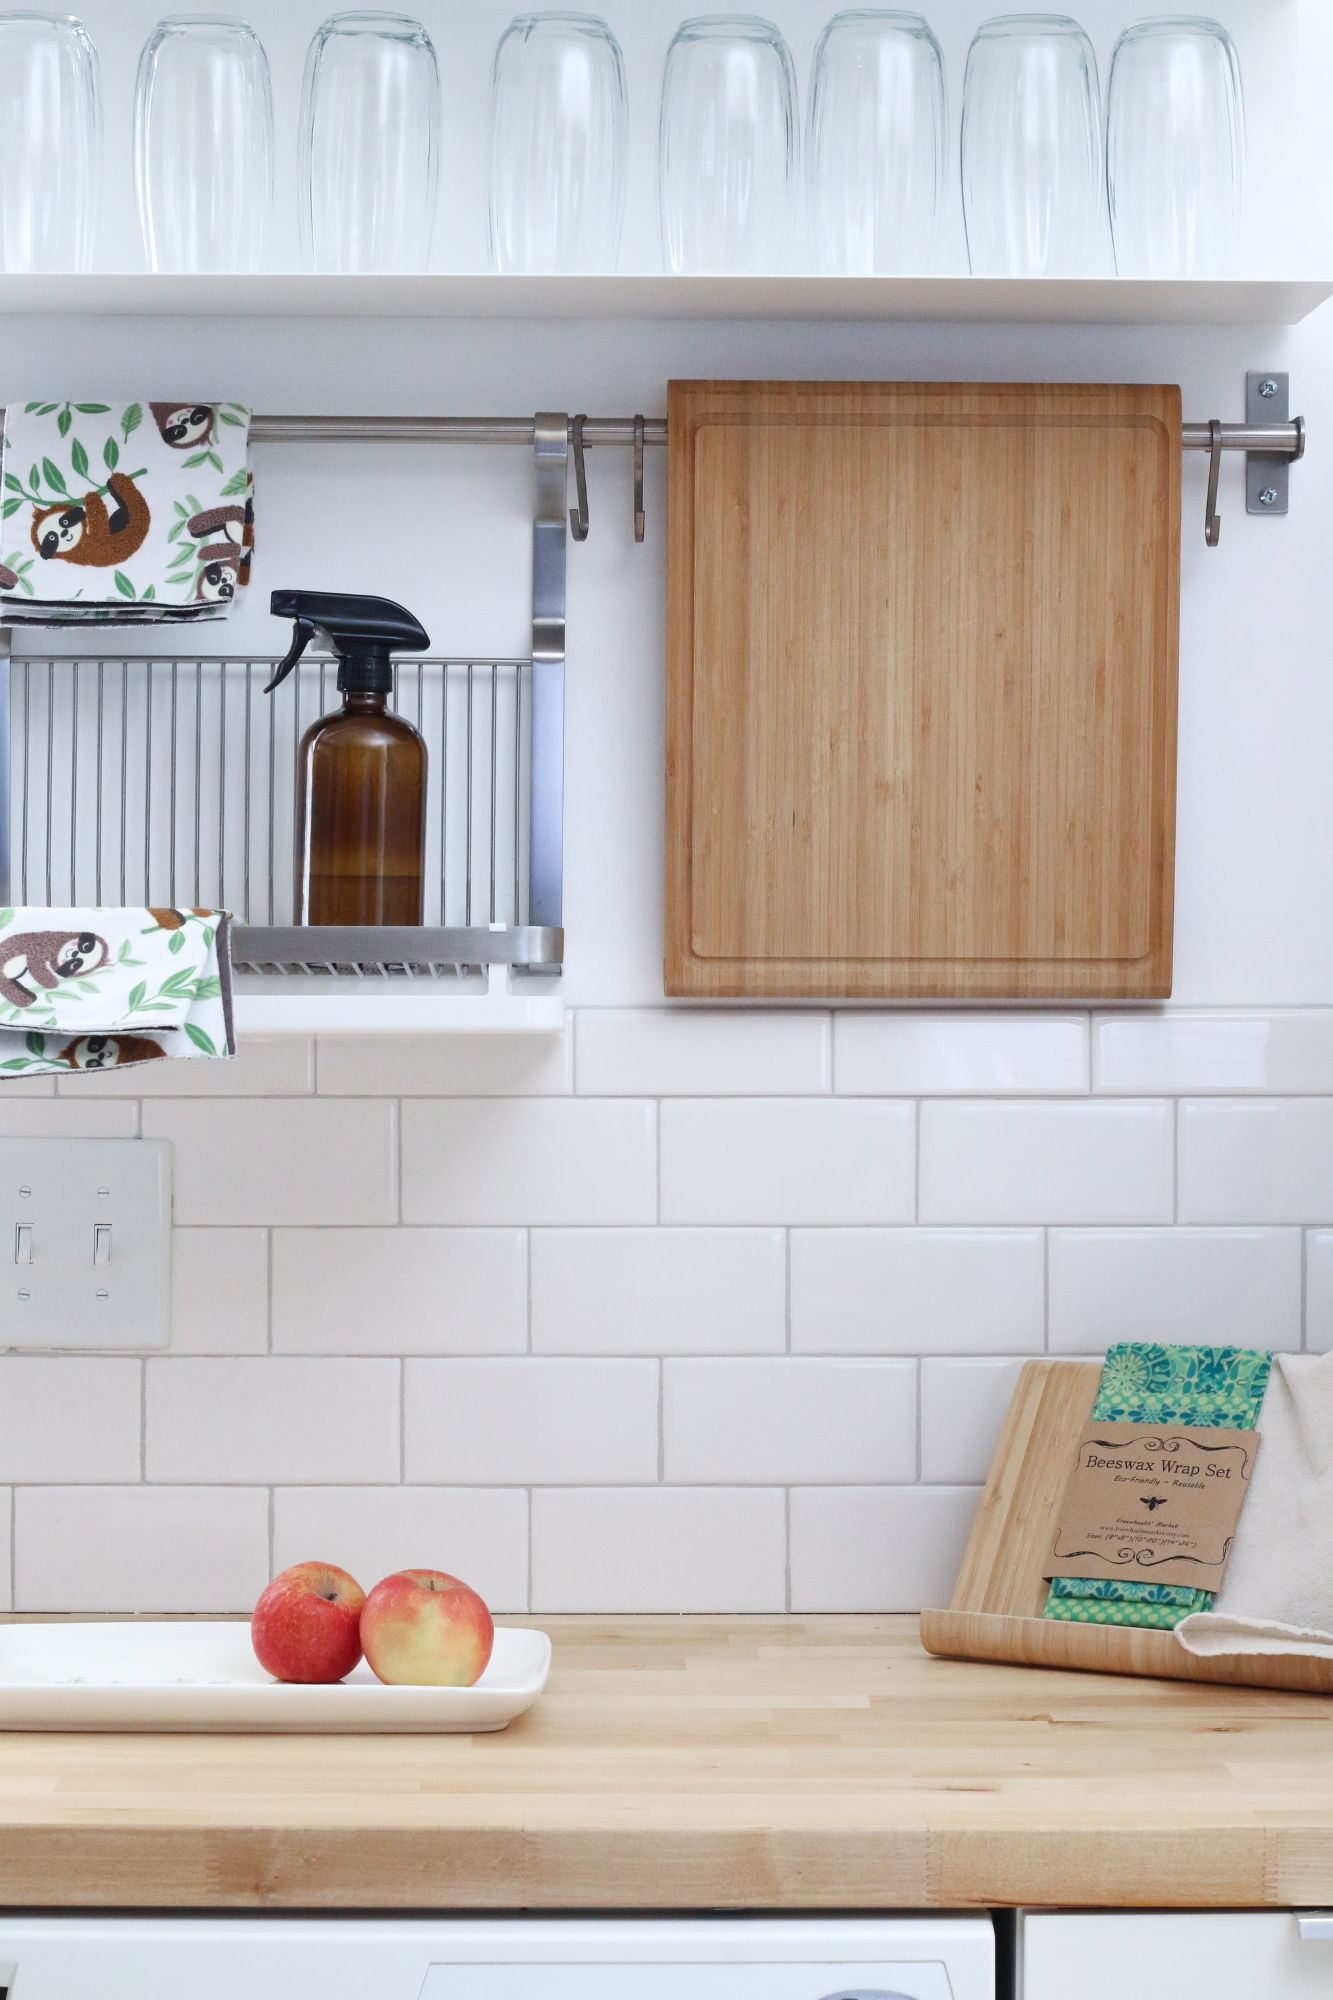 A kitchen surface